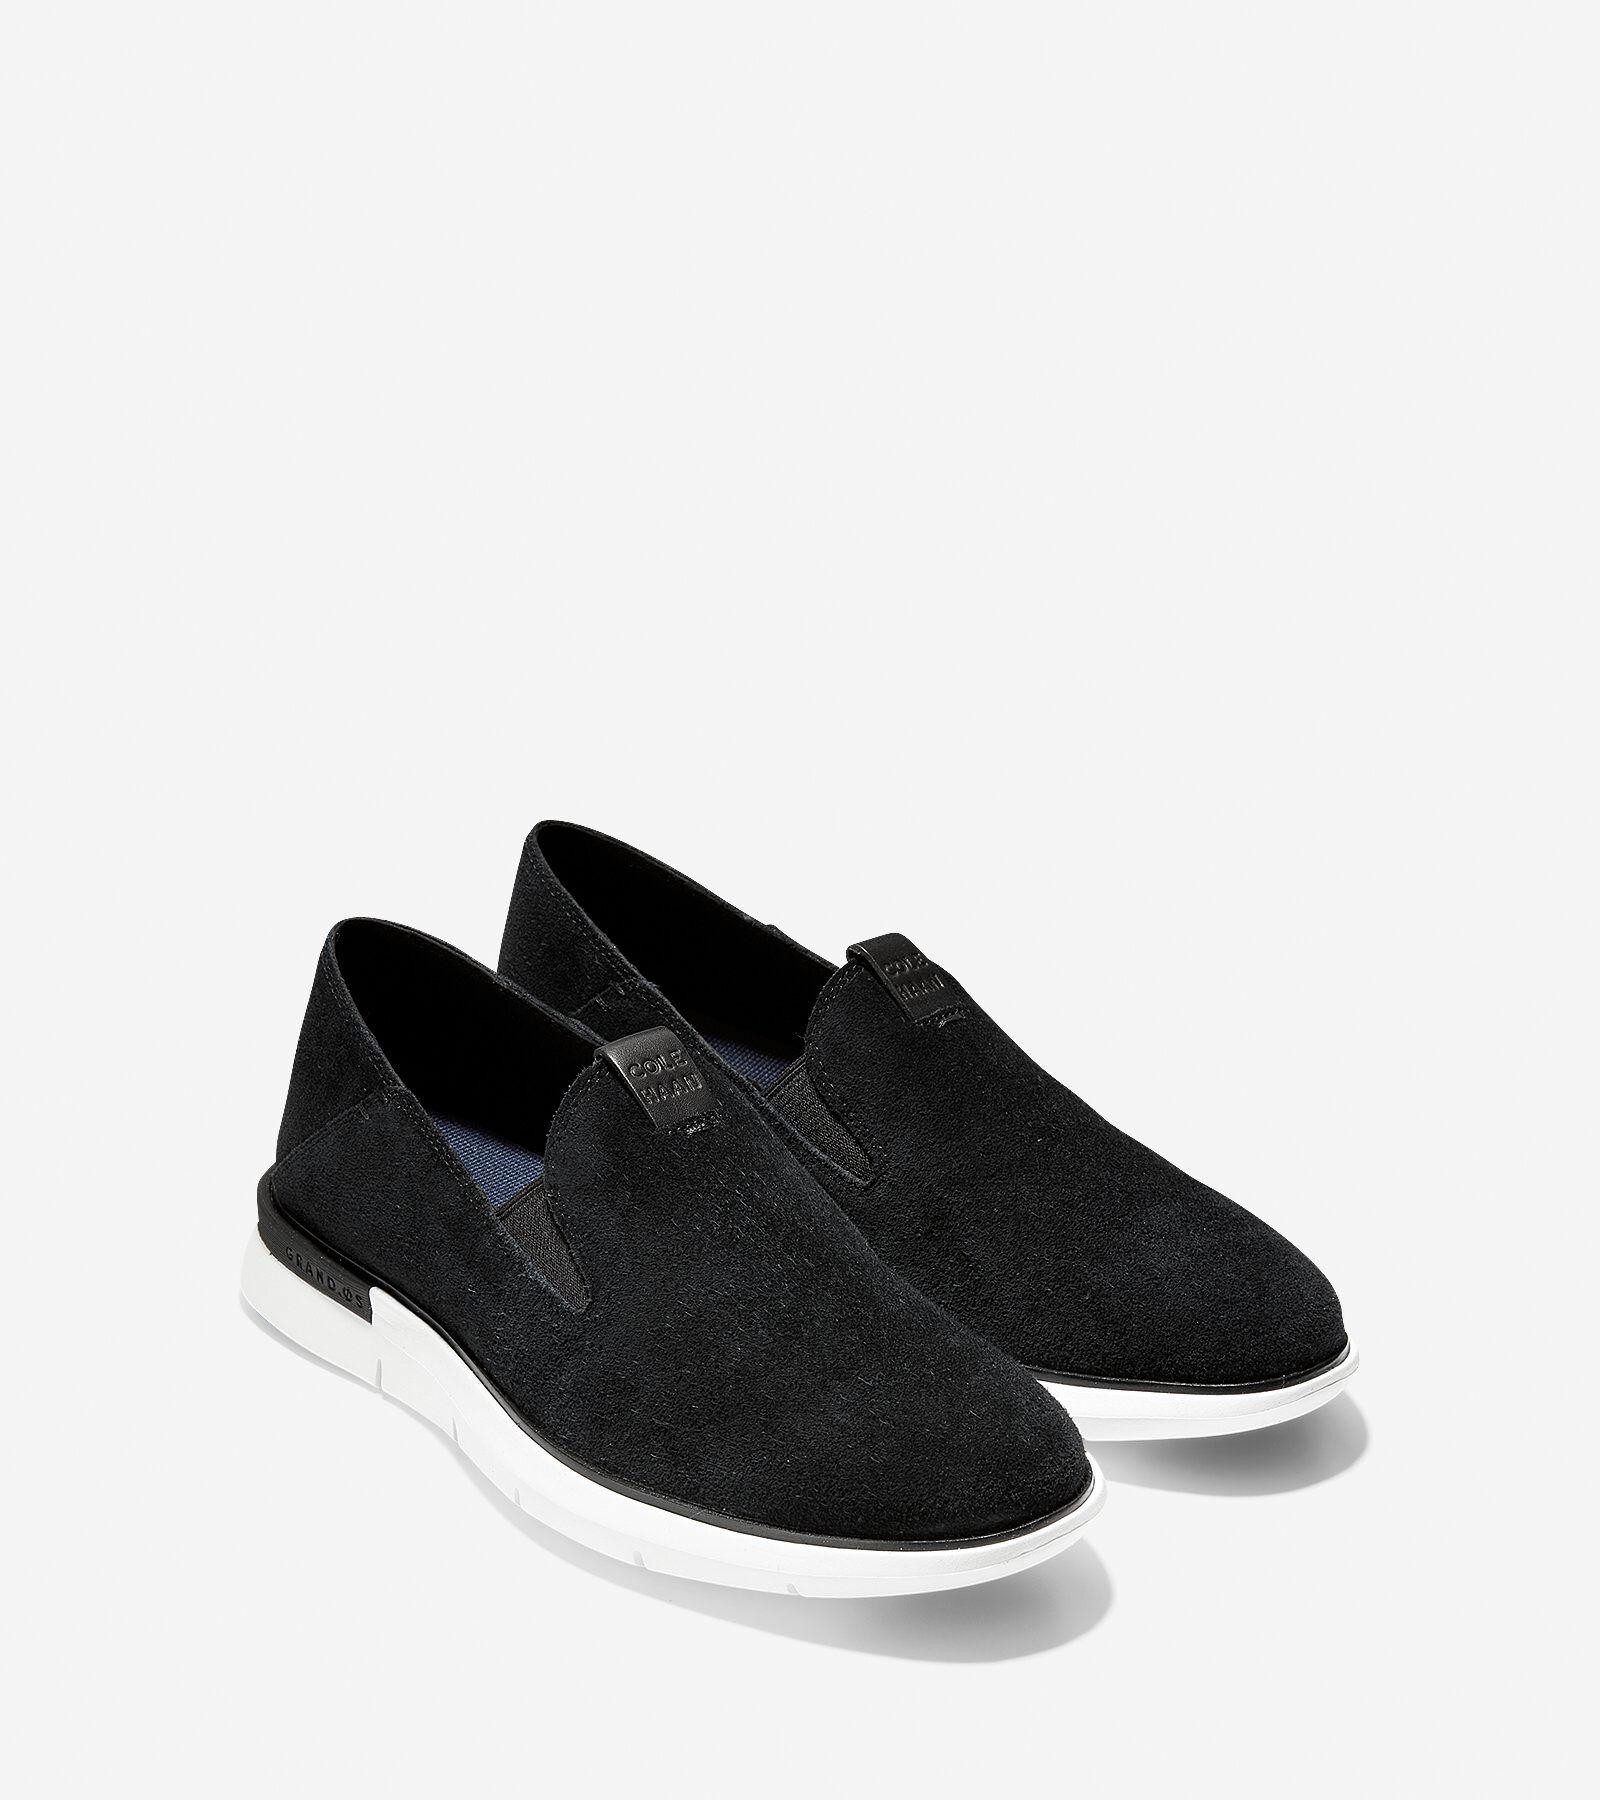 Men's Cole Haan Grand Horizon Slip On Loafer, Size: 11 M, Black/Optic White